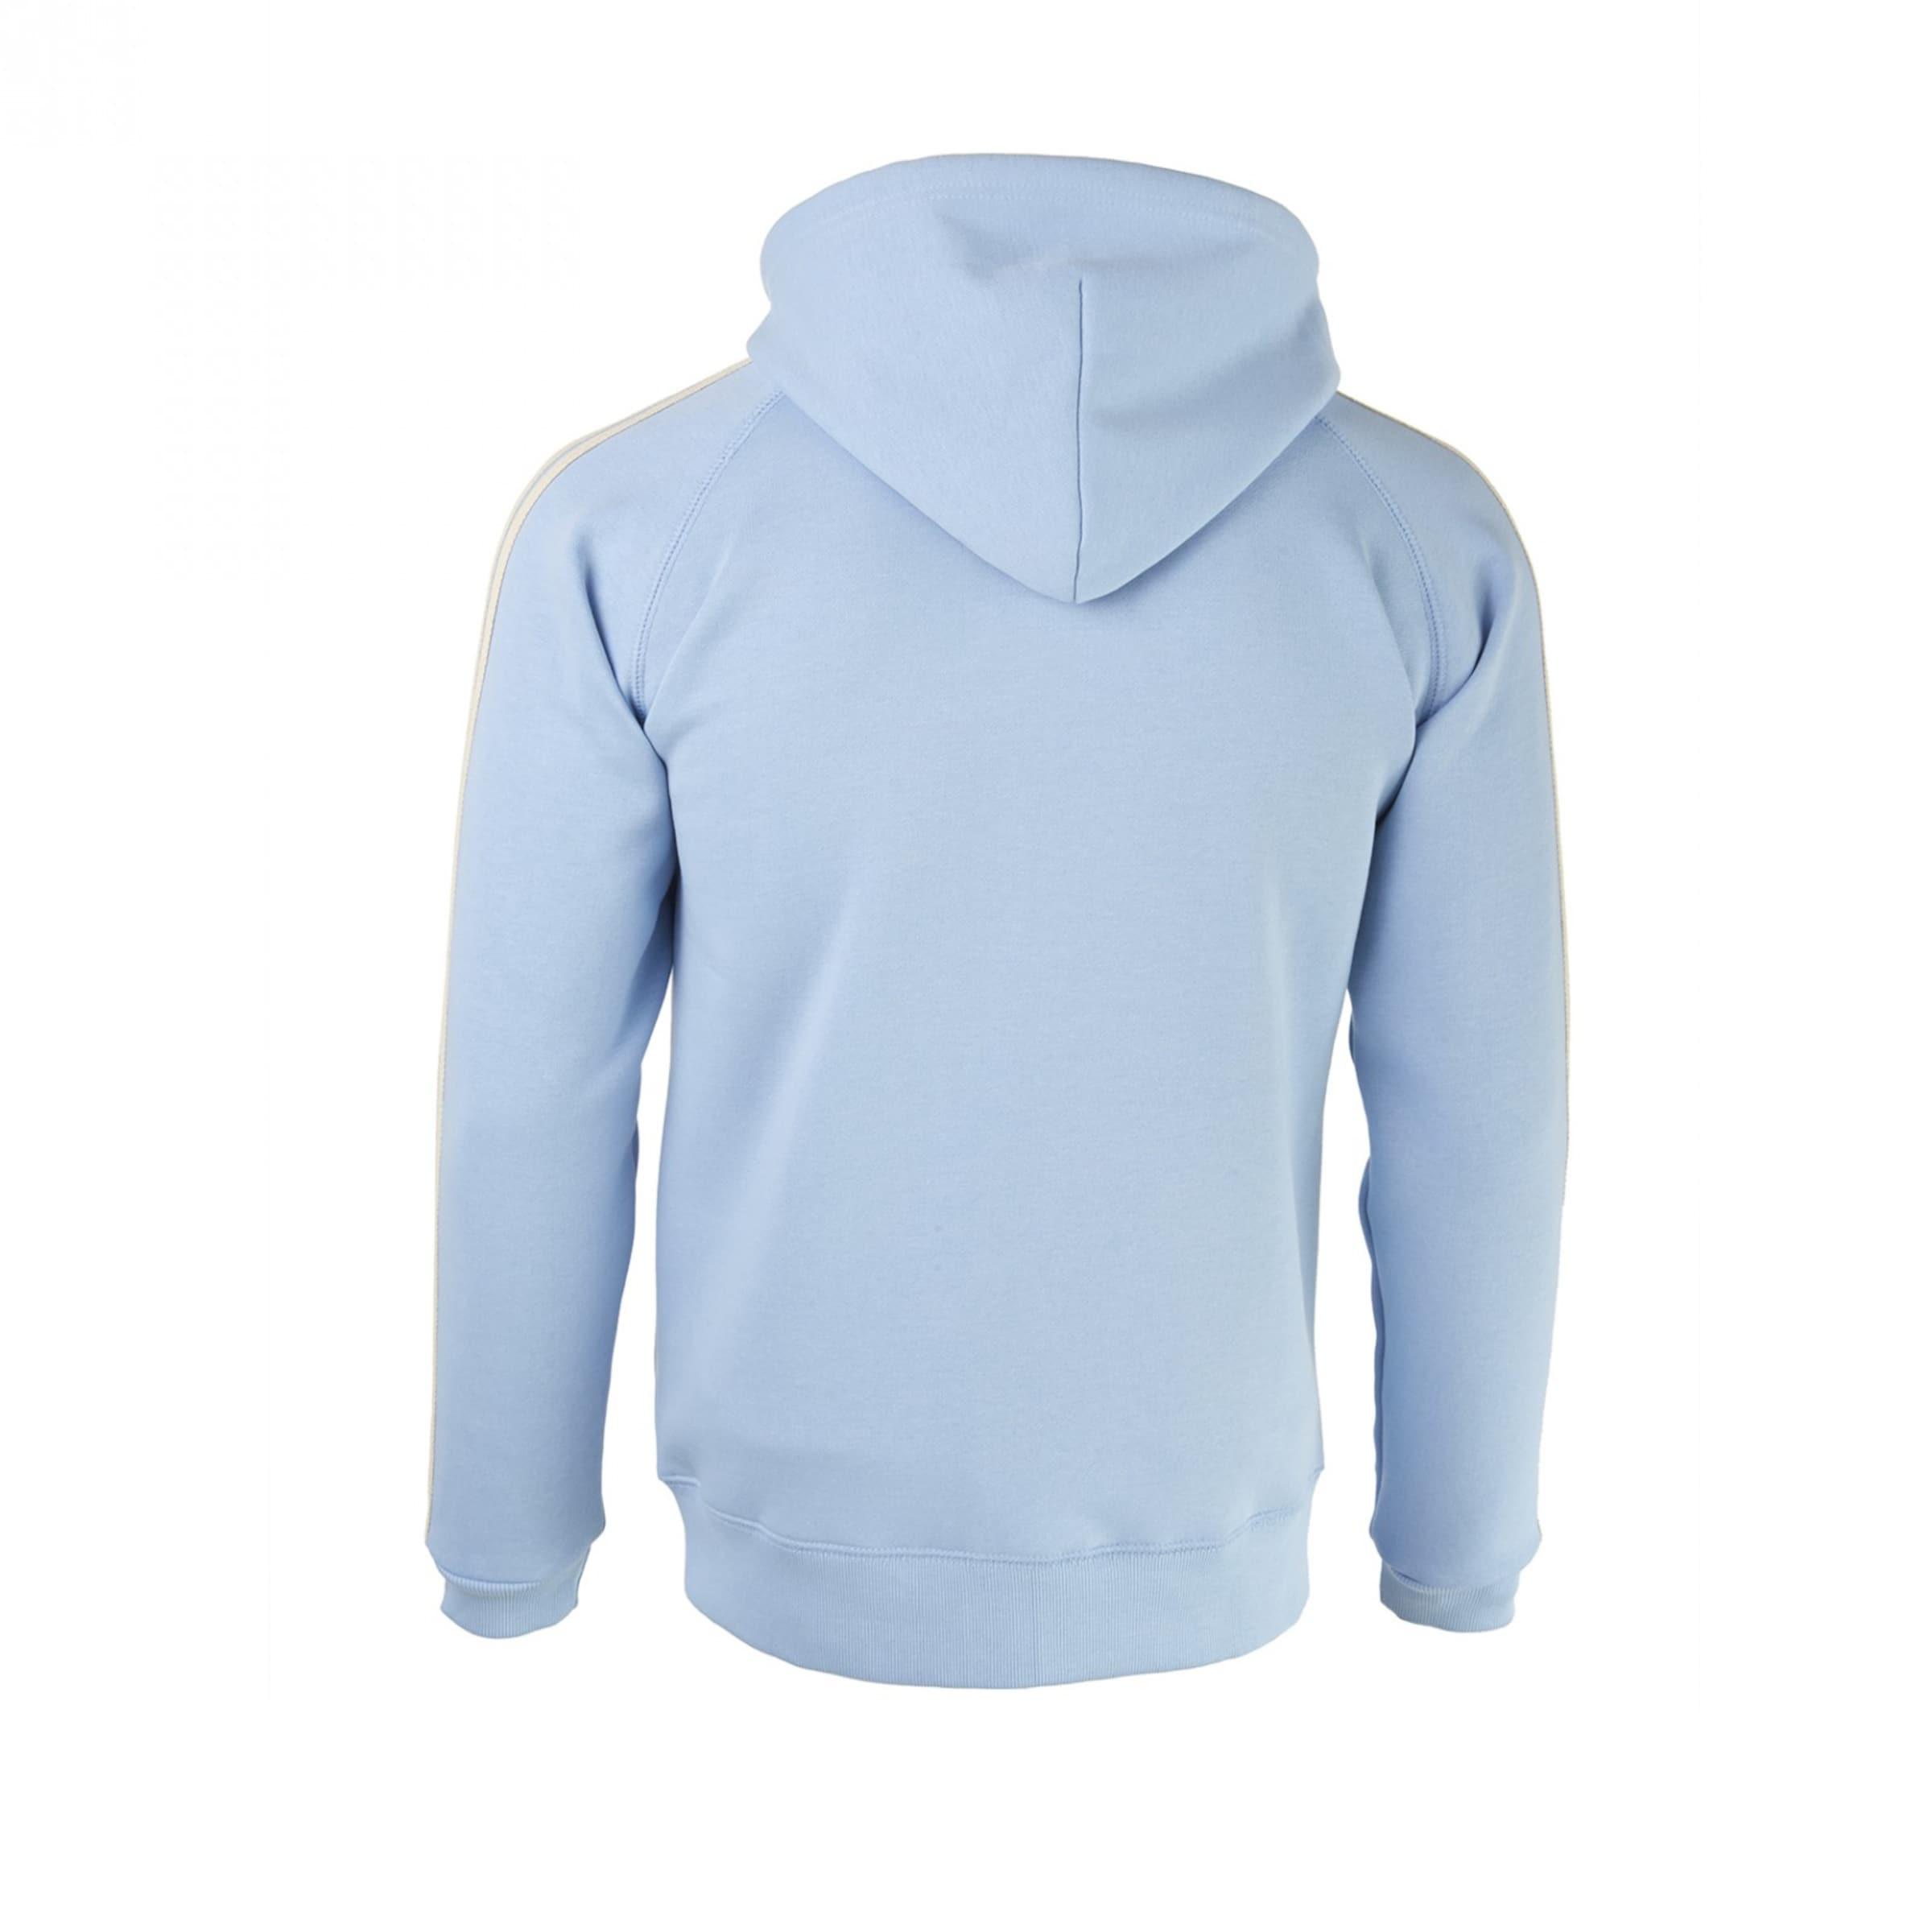 Sweatjacke 'stefano' In 'stefano' 'stefano' In BlauHellblau Brds Brds Brds Sweatjacke BlauHellblau Sweatjacke qMzVpGSU